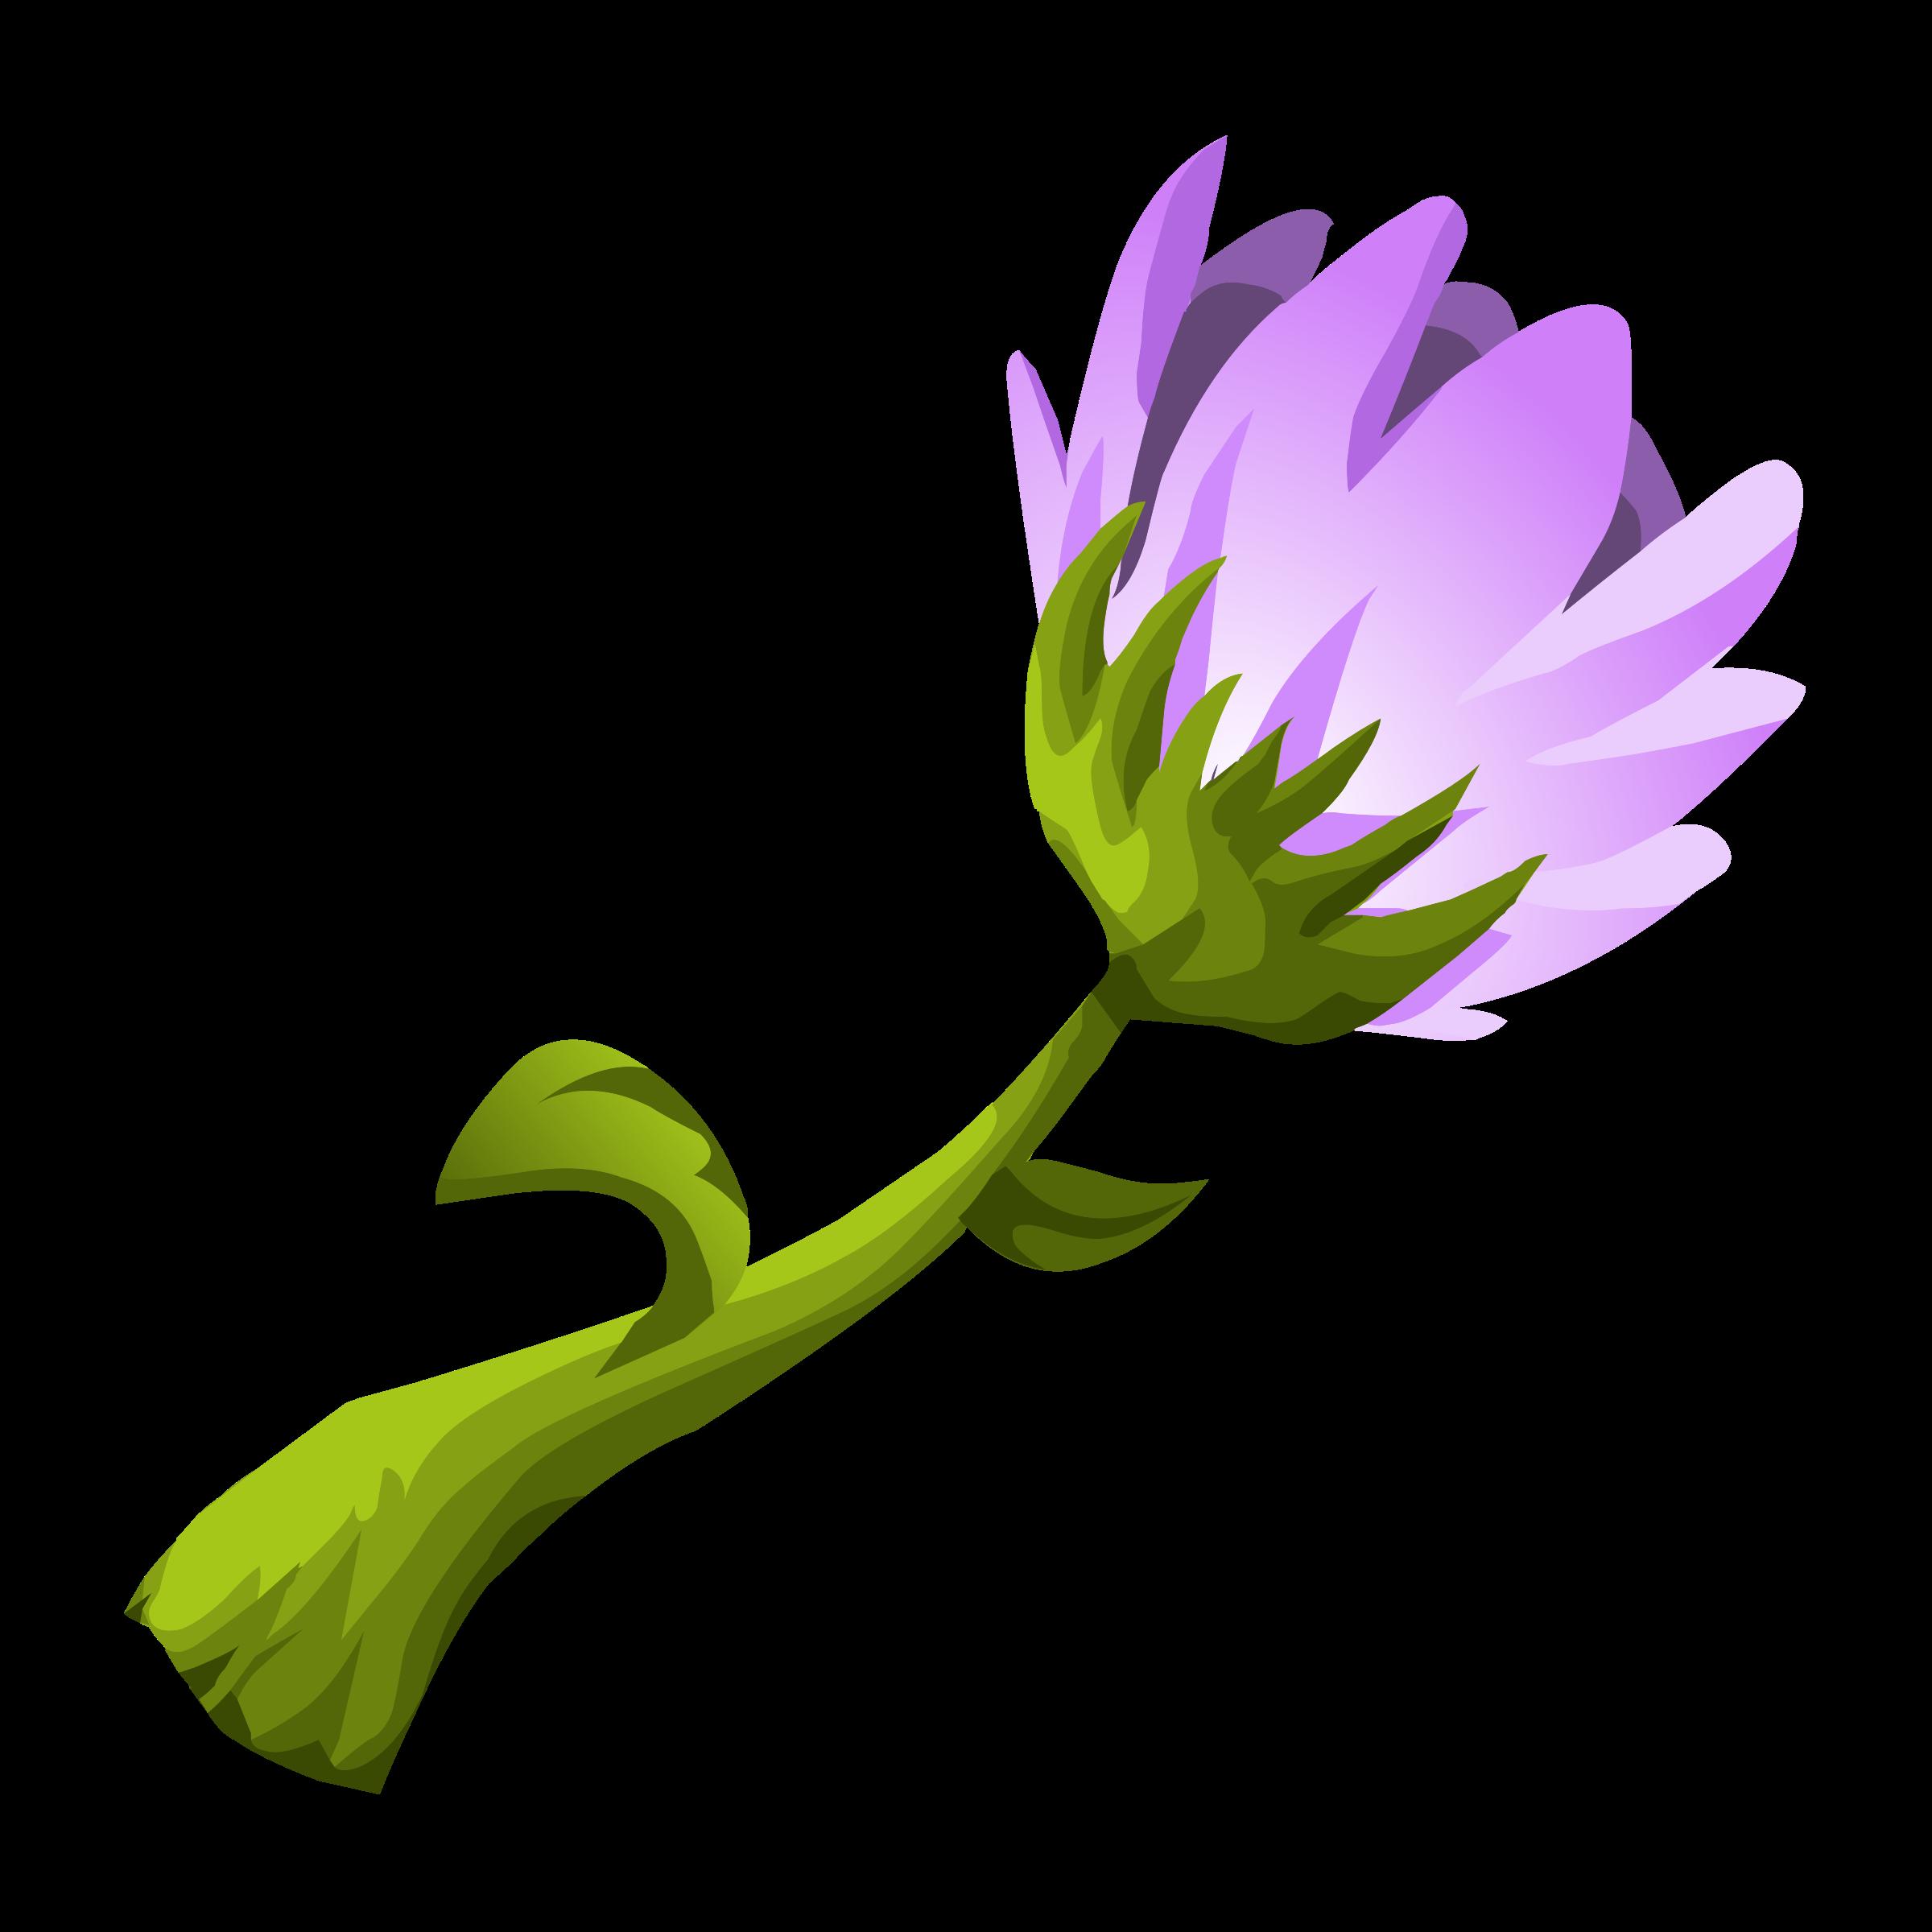 Glitch clipart flowery #2